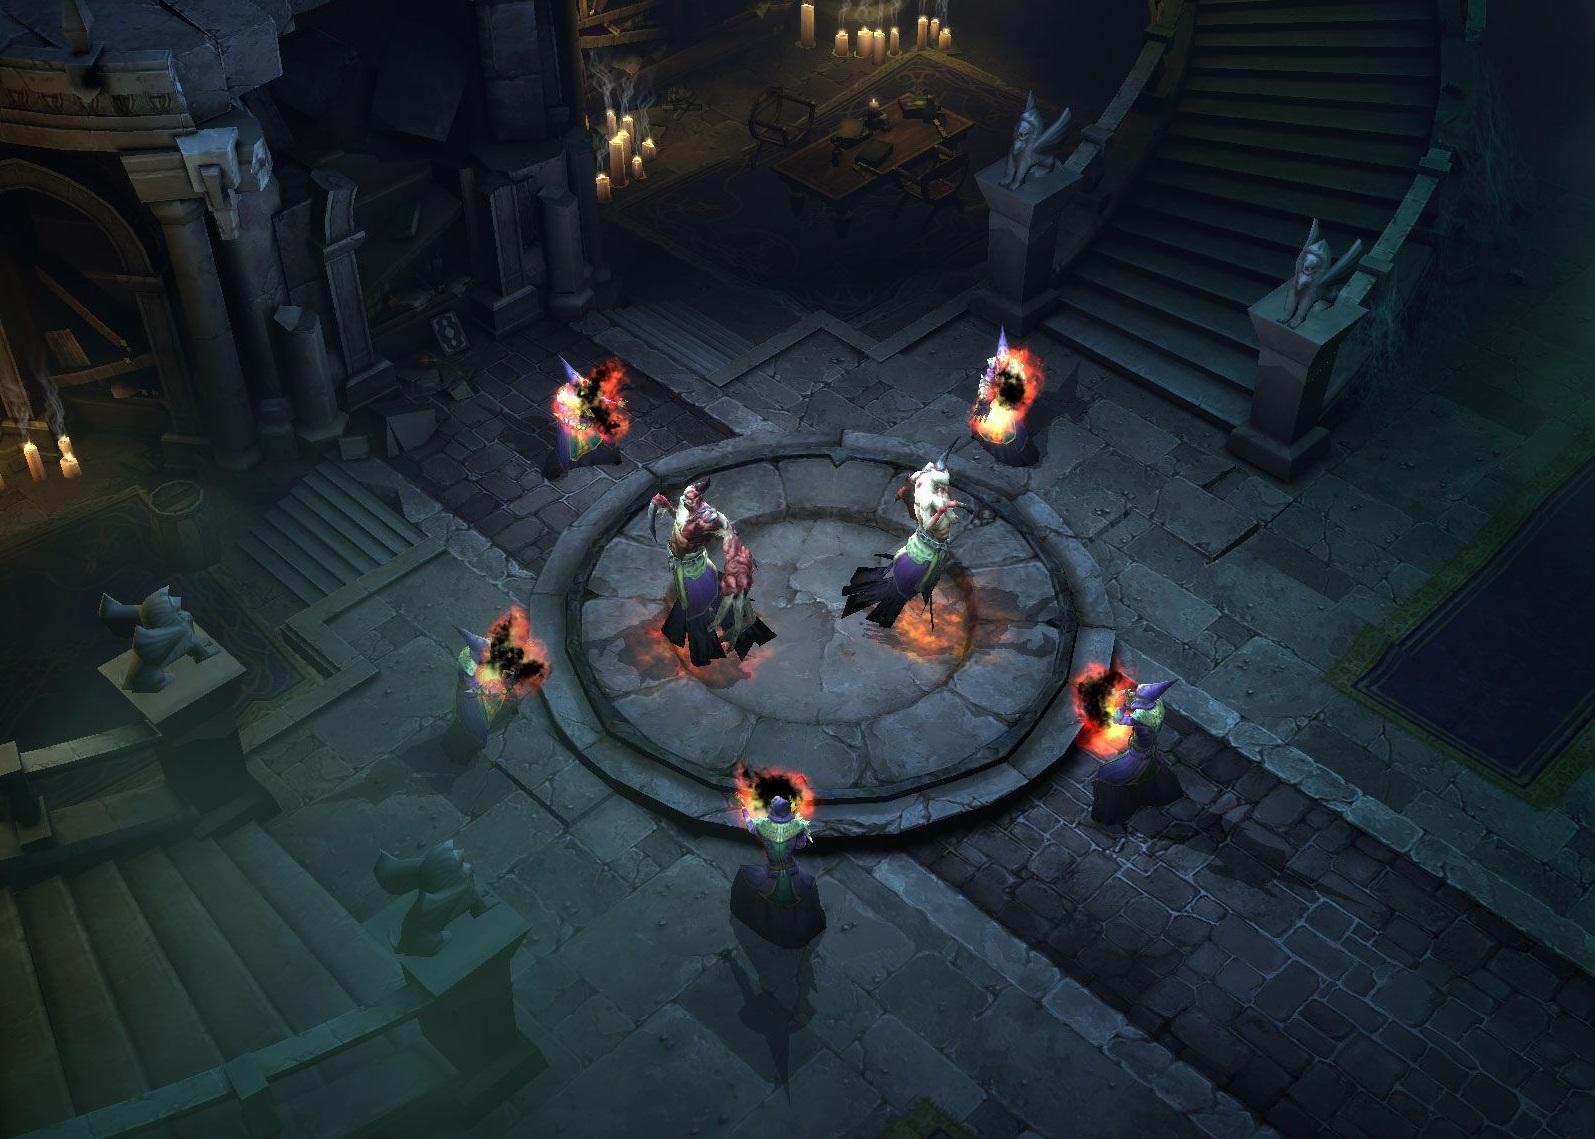 Diablo 3 Pc Download Free Full Version Game Torrent Highly Compressed